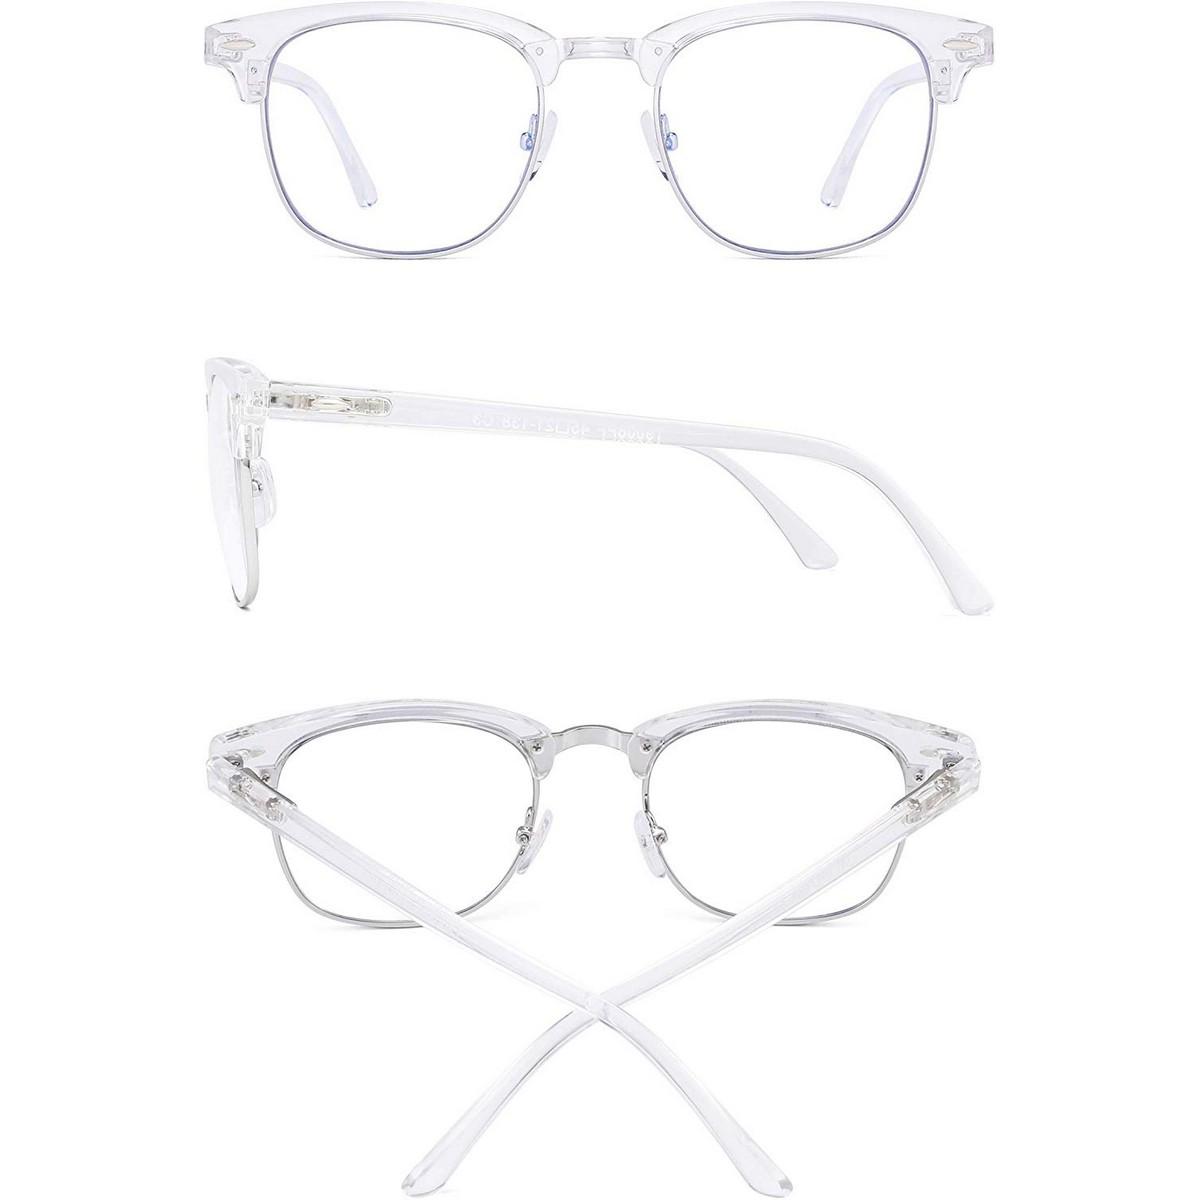 Clear Transparent Blue Light Blocking Computer Glasses Retro Semi-rimless Style Reduce Eye Strain Video Game Eyeglasses Men Women